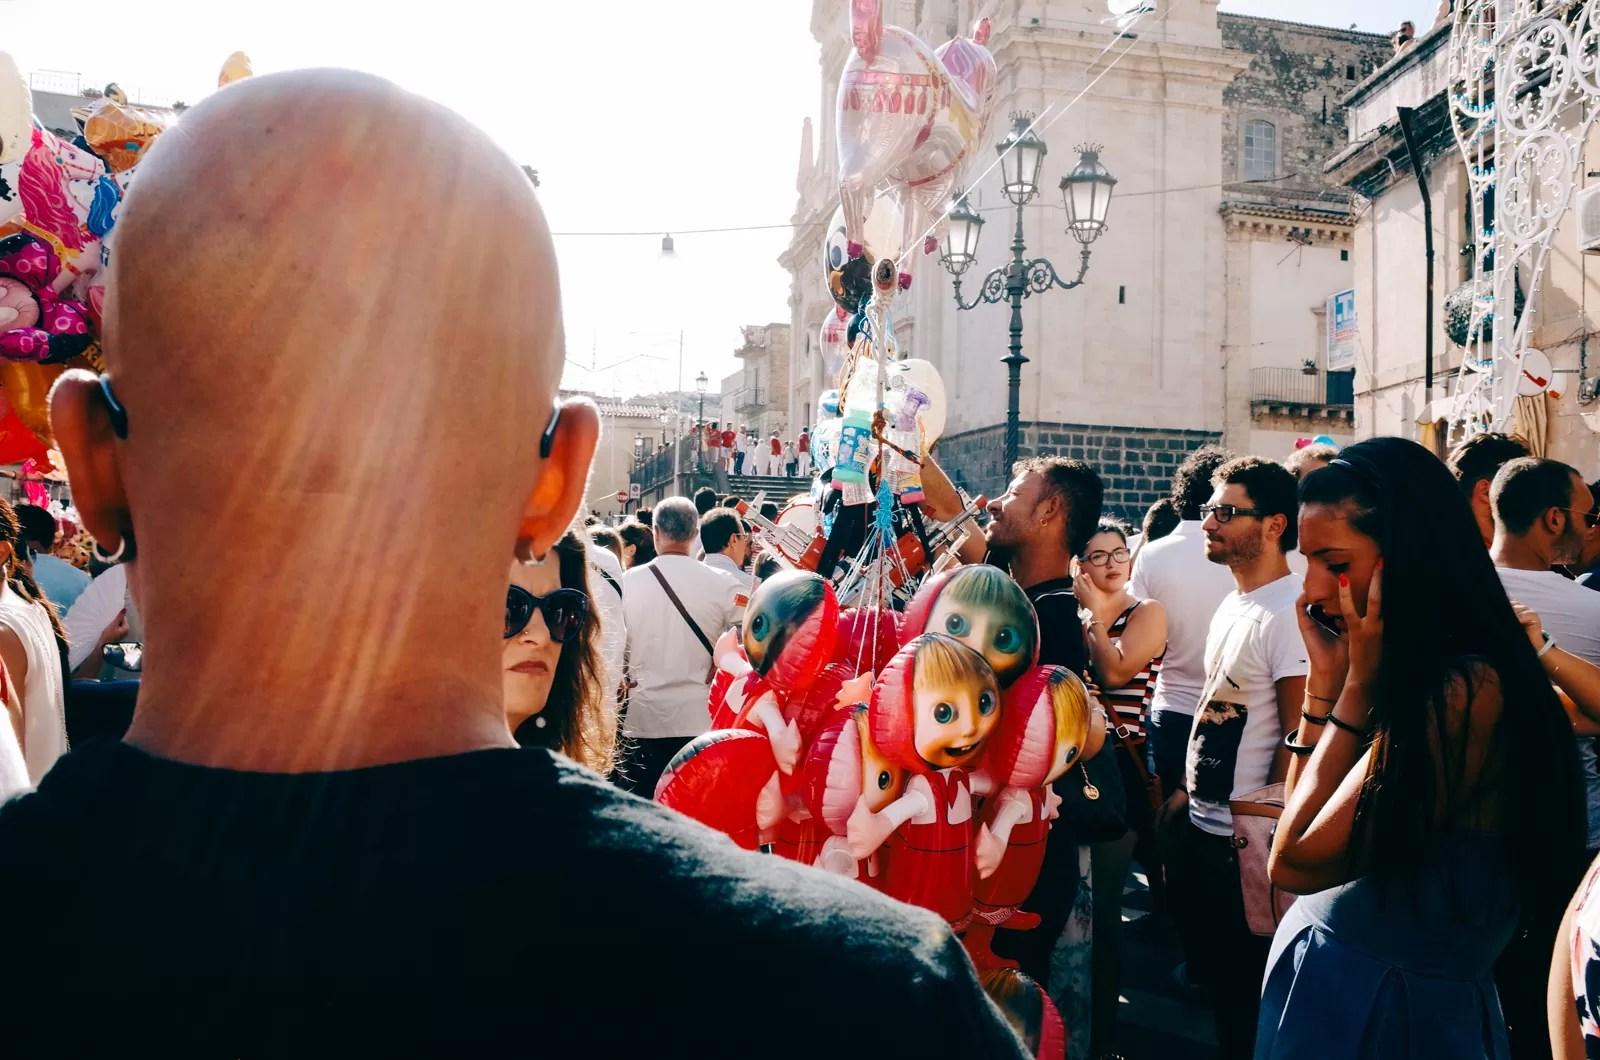 R0004739 - Siciliani in festa 18 Agosto 2015  (Parte 1) Street Photography Session - fotostreet.it